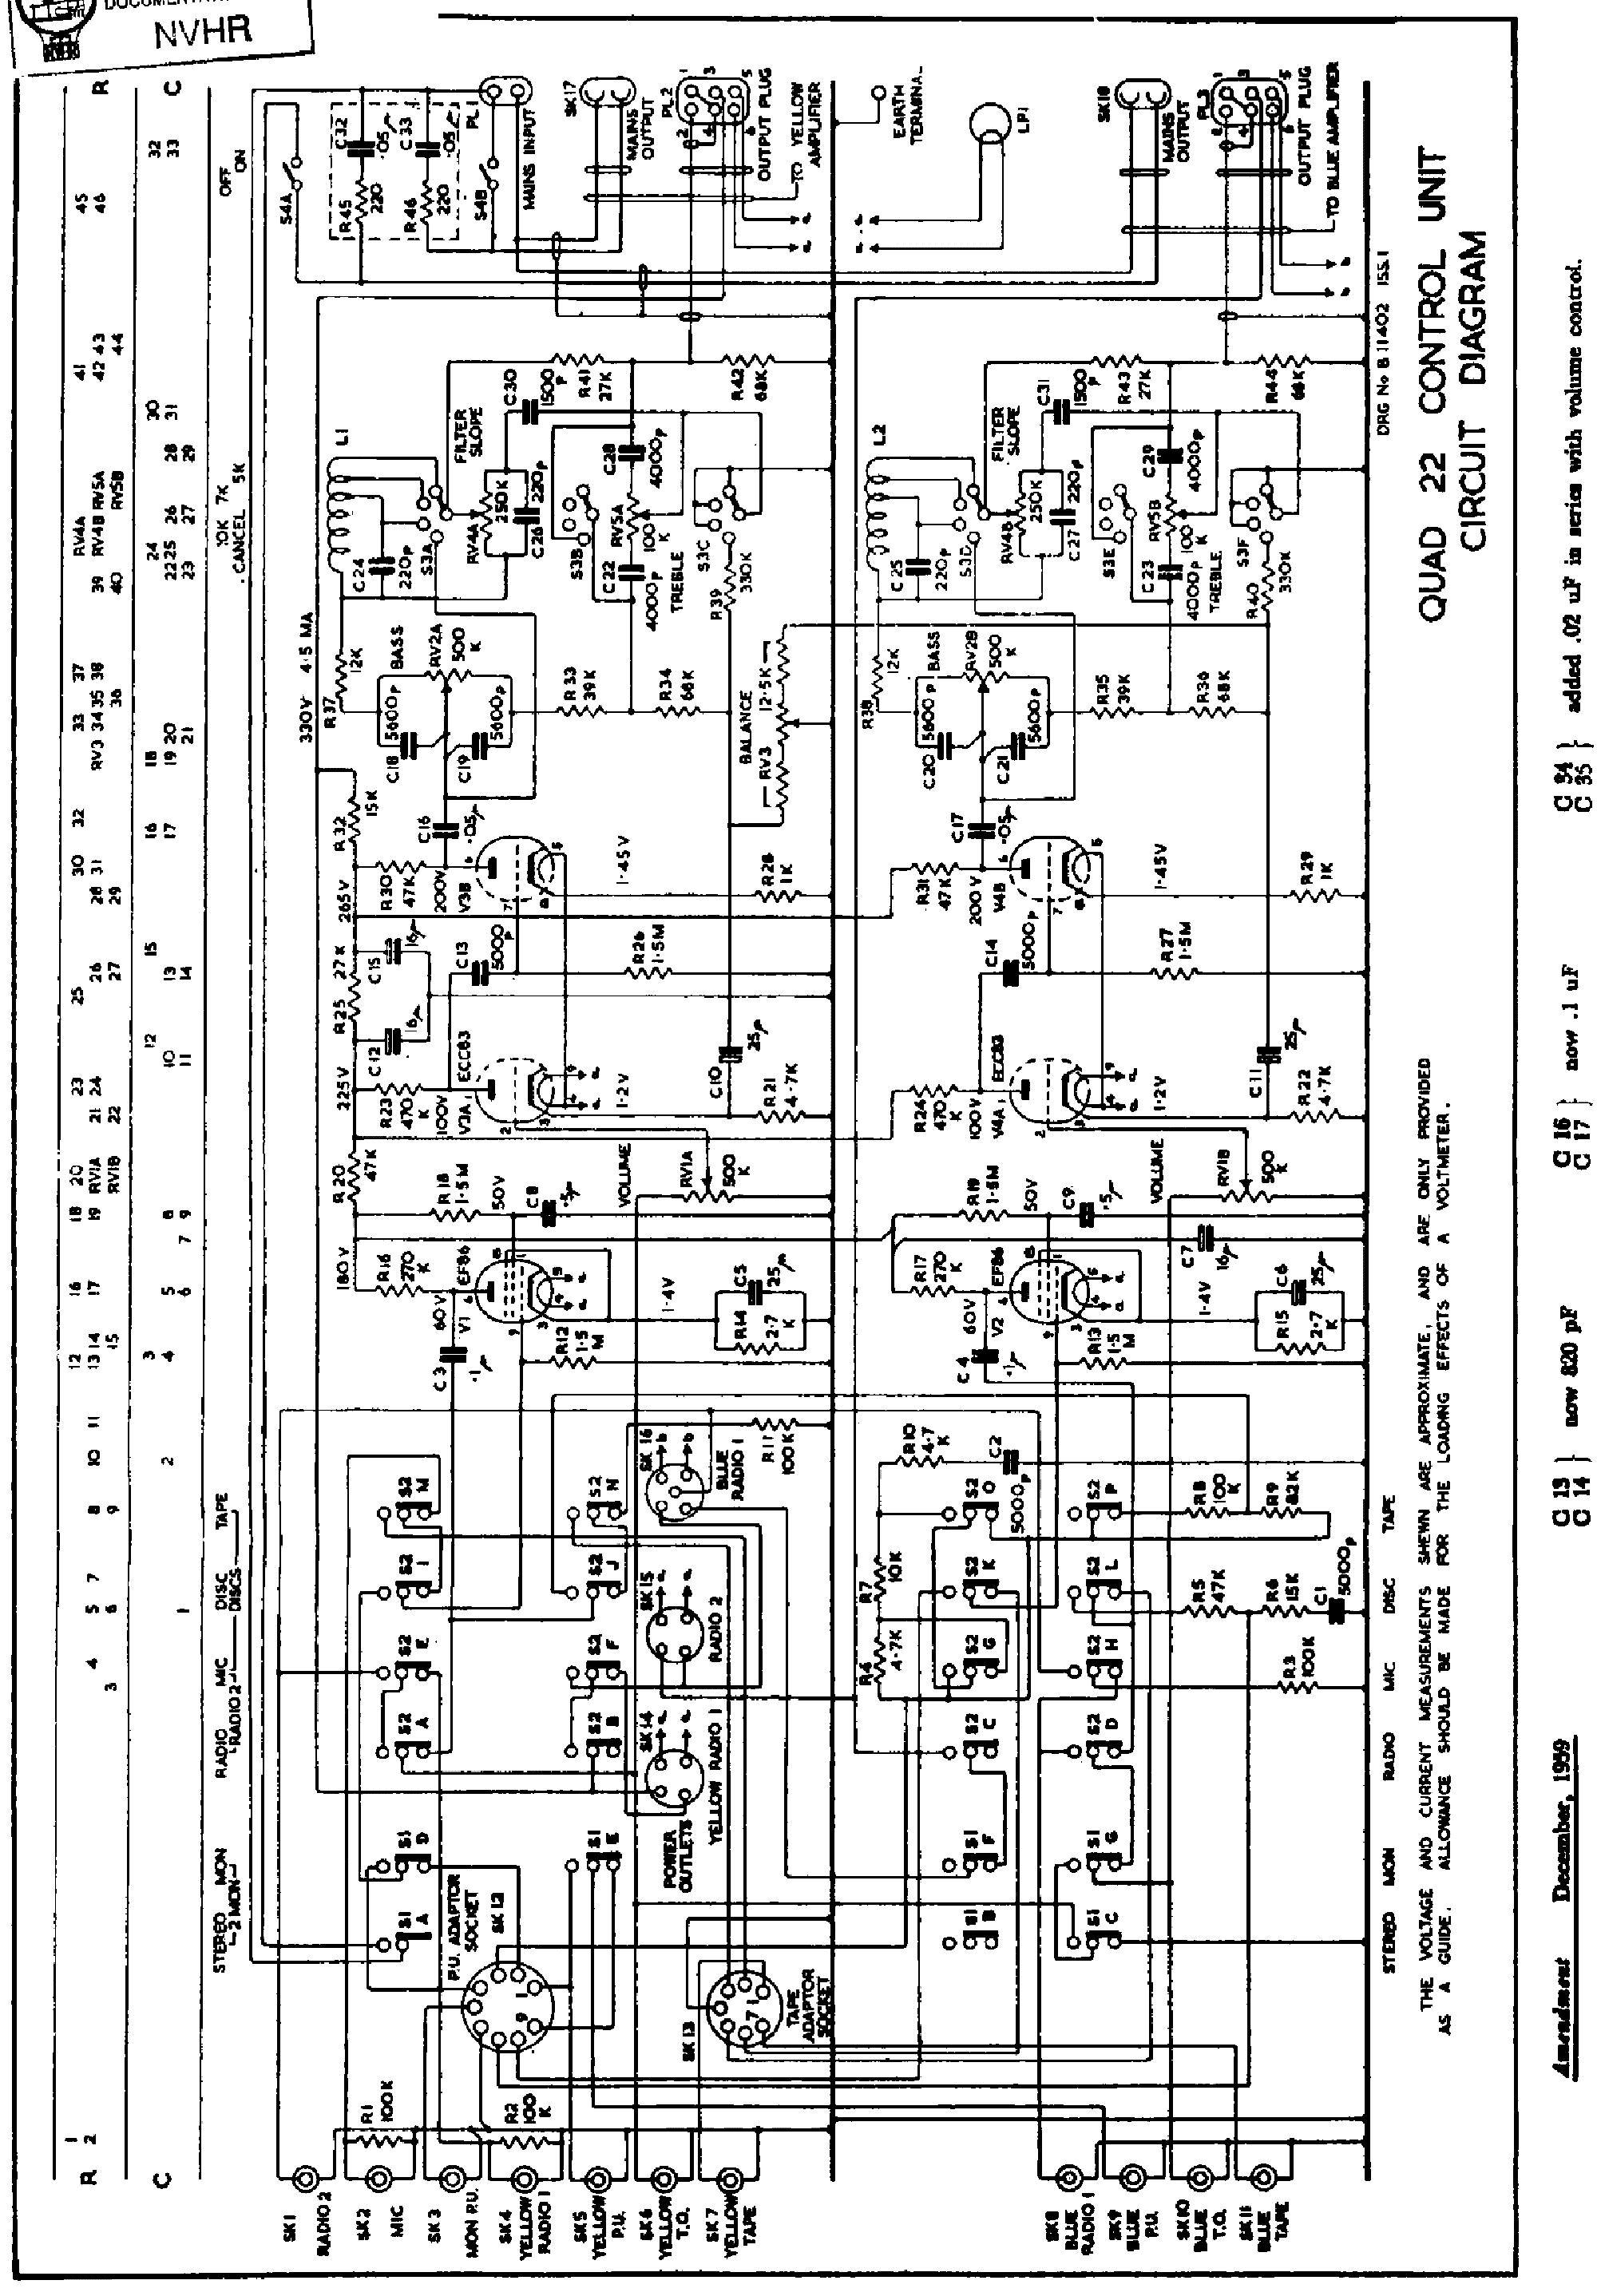 quad 606 service manual download  schematics  eeprom